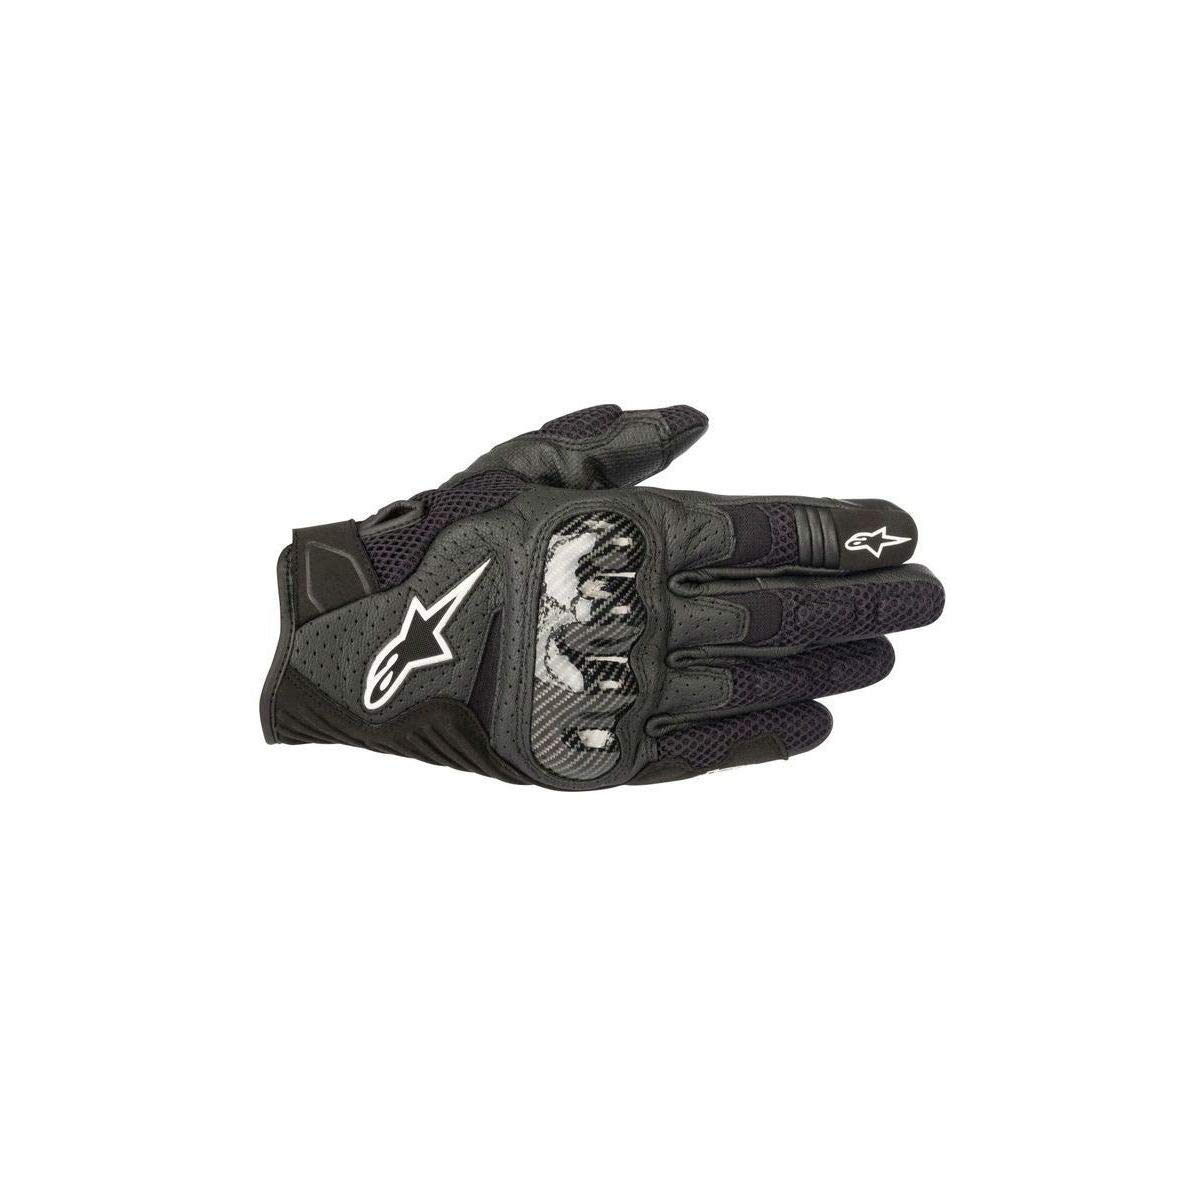 Alpinestars SMX-1 Air Men's Street Motorcycle Gloves - Black/Large by Alpinestars